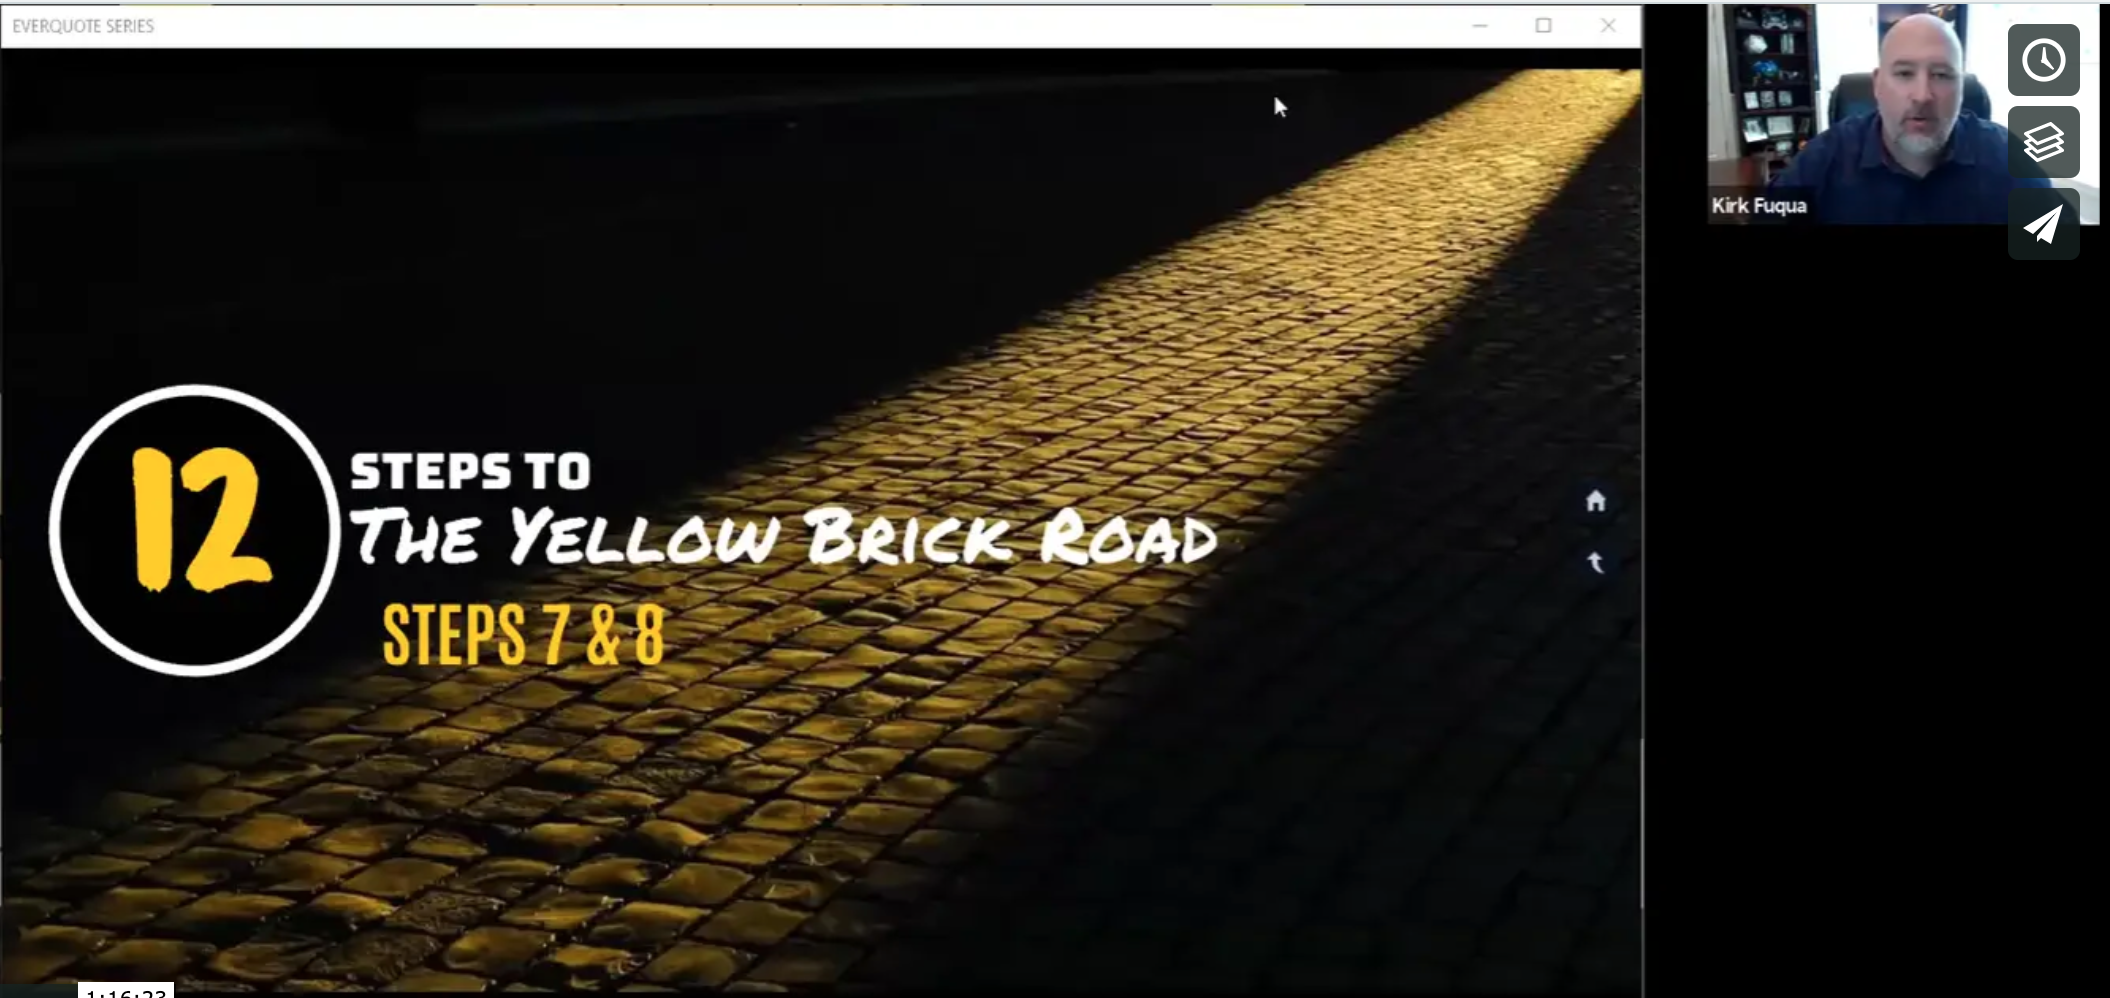 Insurance Sales Process: Part 4 (Yellow Brick Road Parts 7 & 8) with Kirk Fuqua